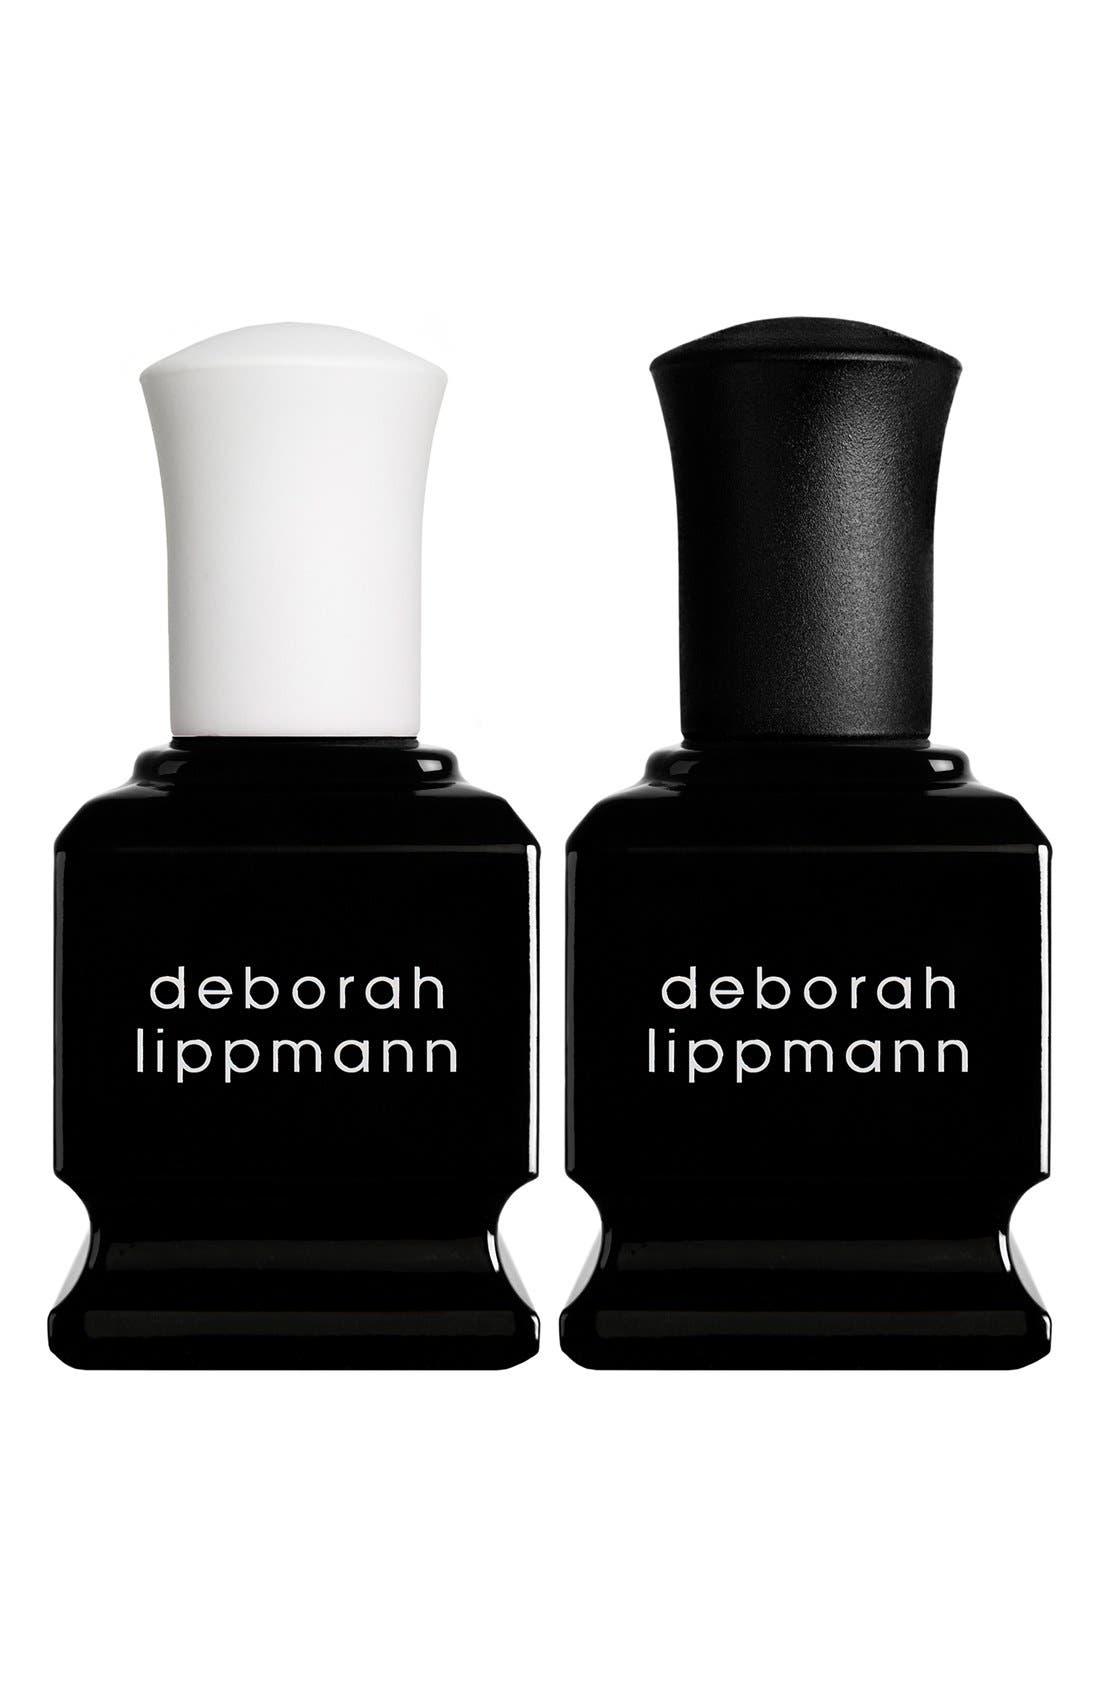 Deborah Lippmann 'Gel Lab Pro' Travel Set